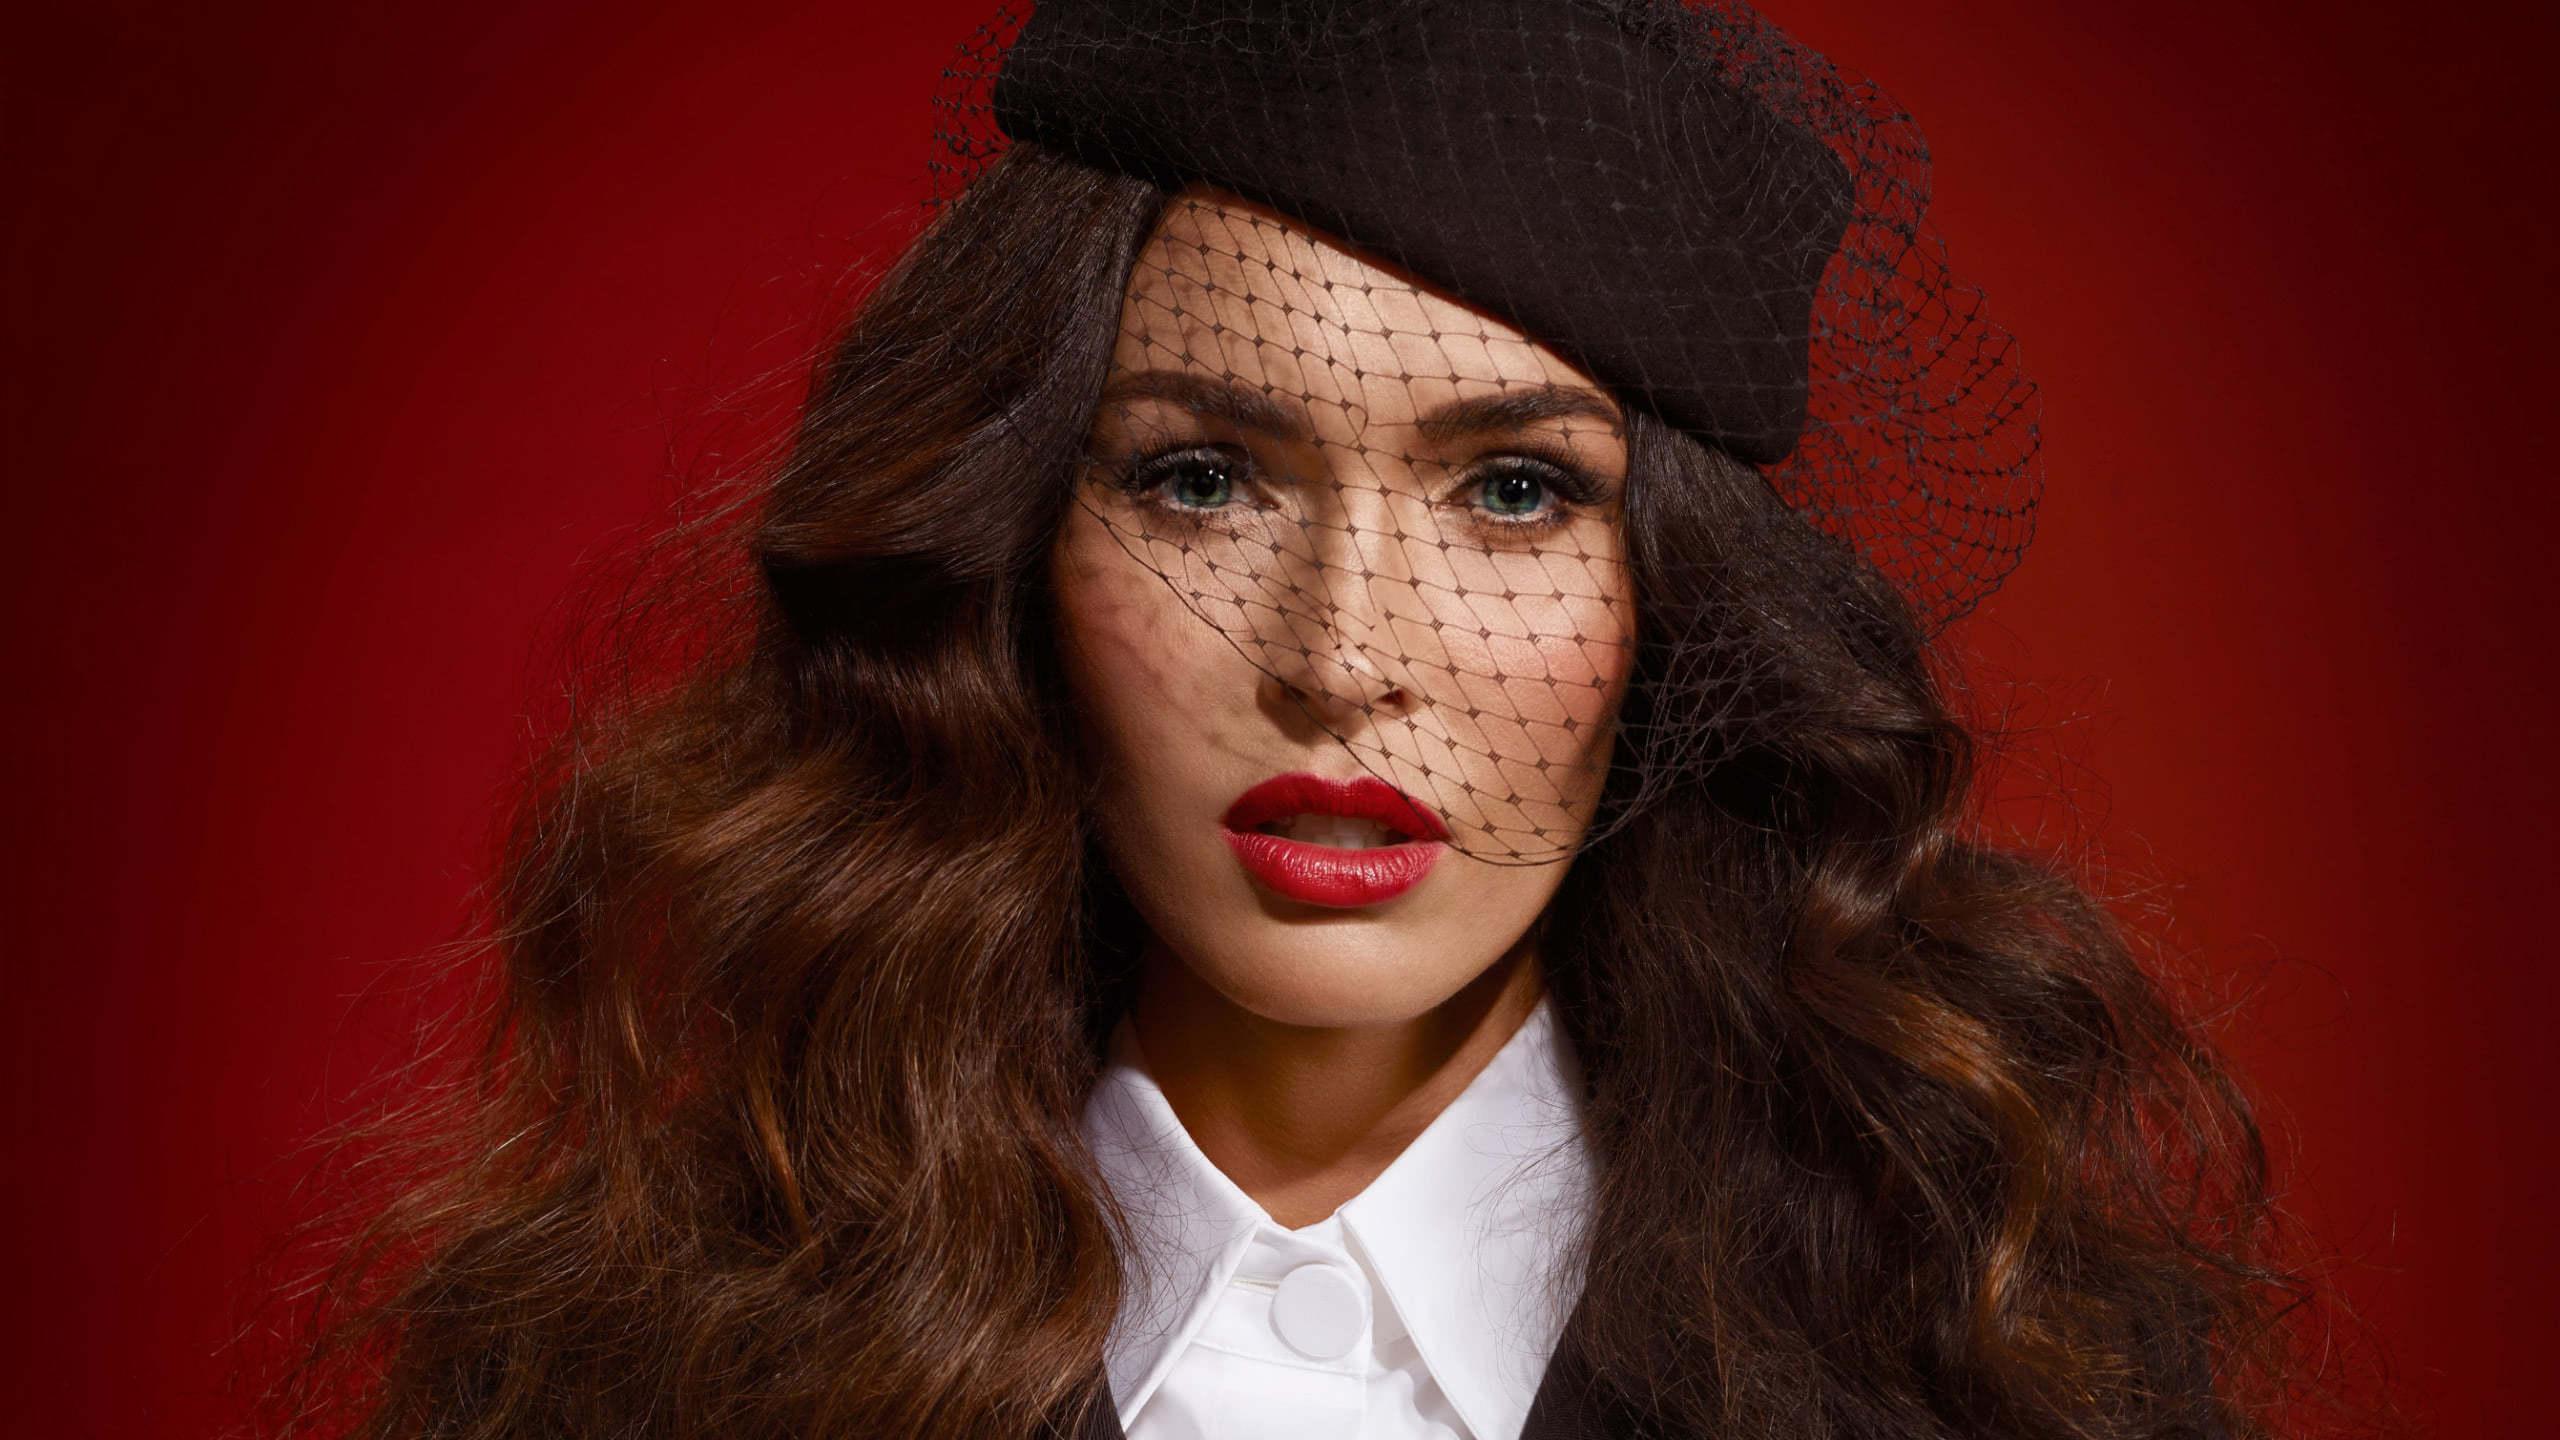 Megan Fox Portrait Wqhd 1440p Wallpaper Pixelz